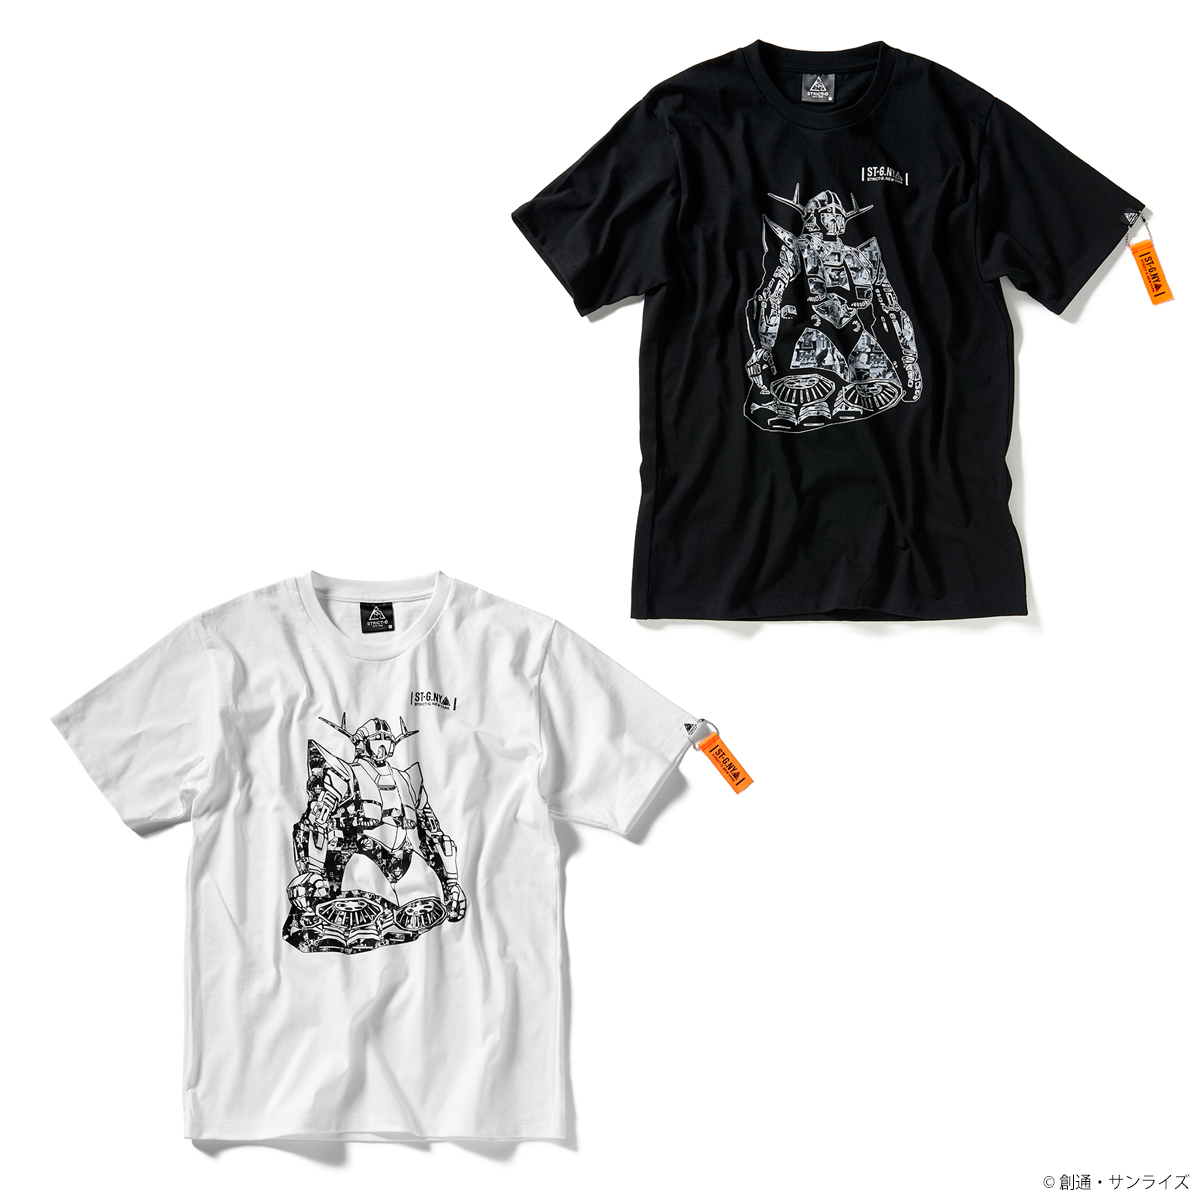 STRICT-G NEW YARK Tシャツ ジオングコラージュ柄